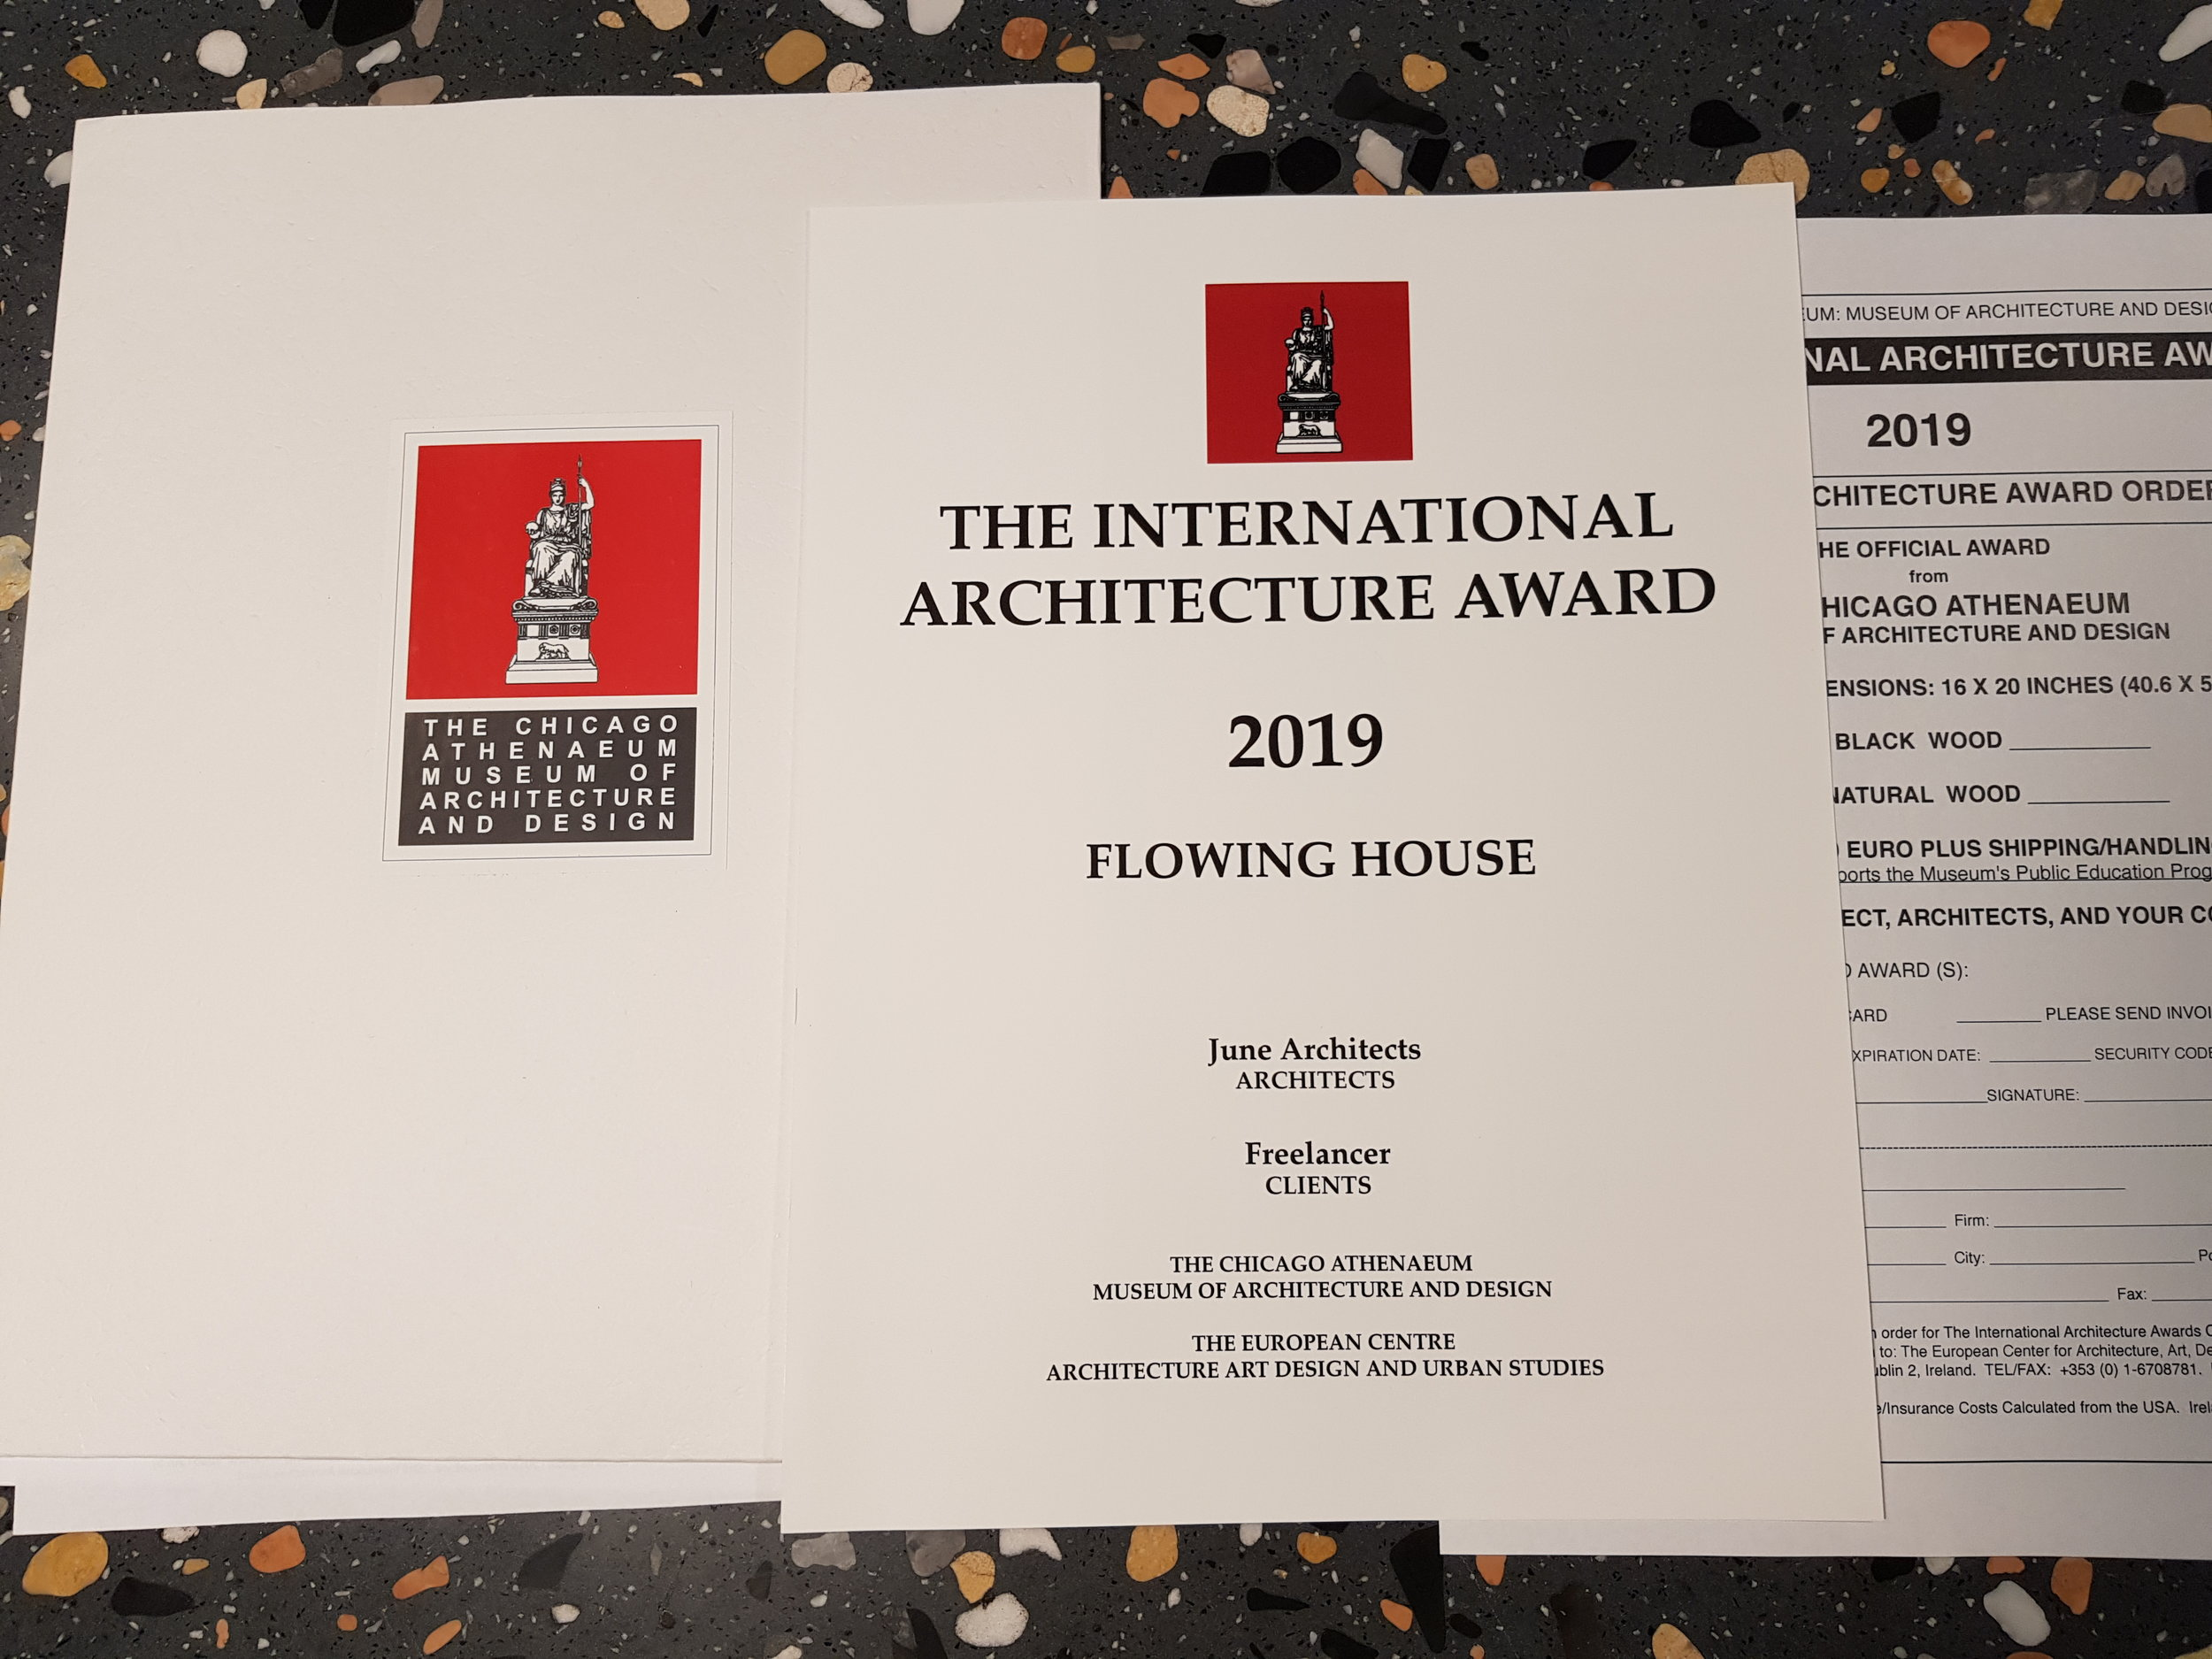 2019 THE INTERNATIONAL ARCHITECTURE AWARDS 흐르는 집 1.jpg